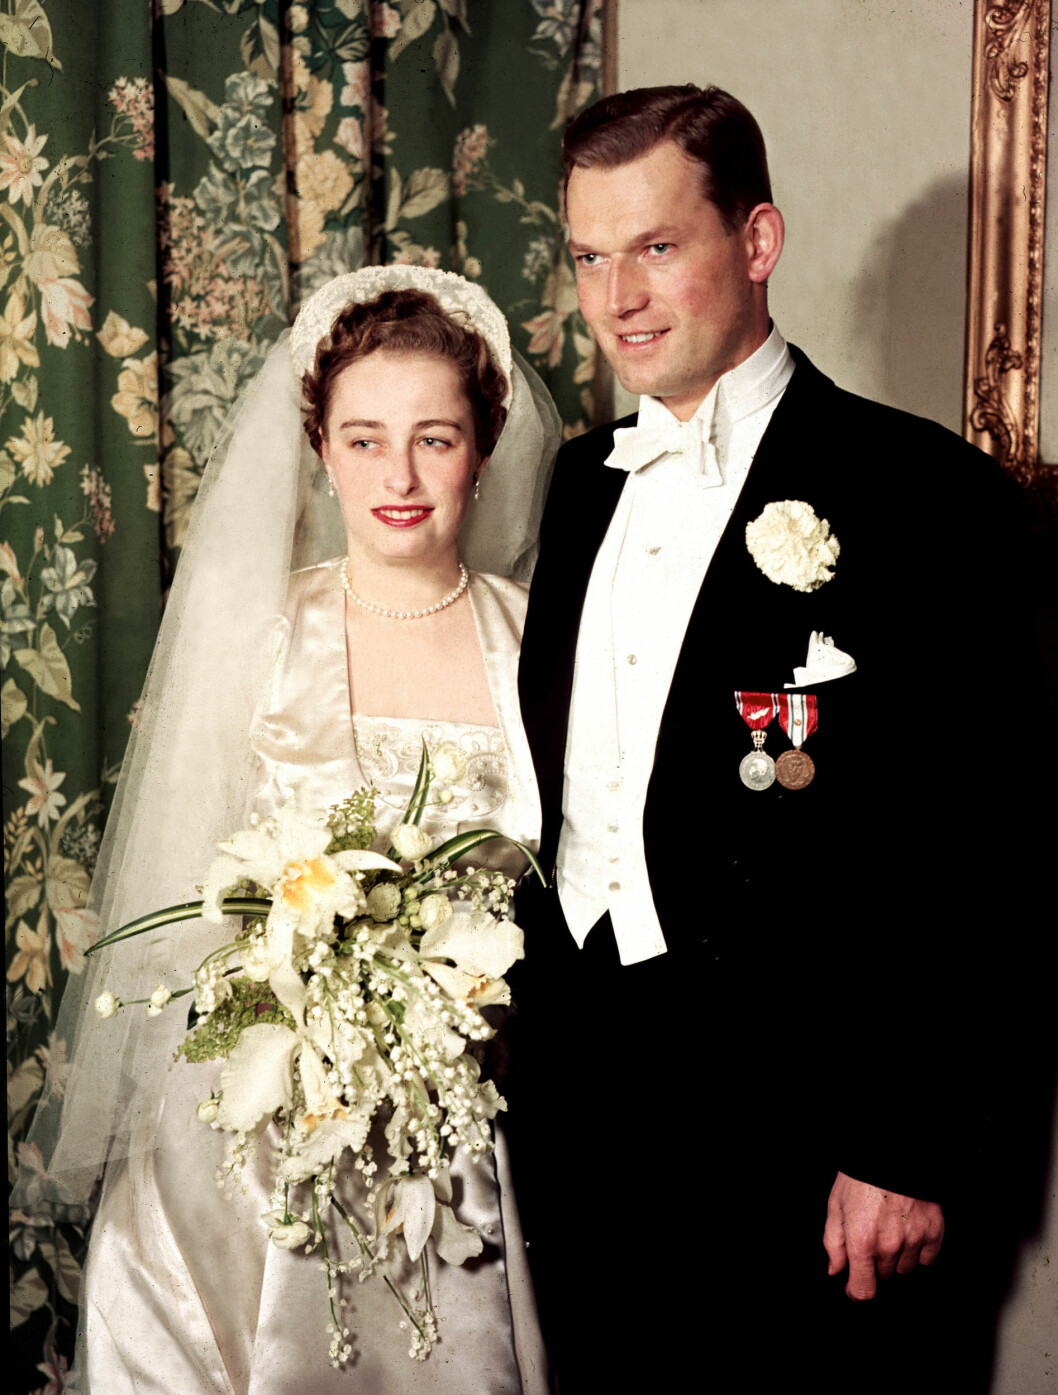 <strong>BRYLLUPET:</strong> Prinsesse Ragnhild gifter seg med skipsreder Erling Lorentzen 15. mai 1953. Prinsessen døde søndag i parets hjem i Rio de Janeiro, 82 år gammel.   Foto: NTB scanpix